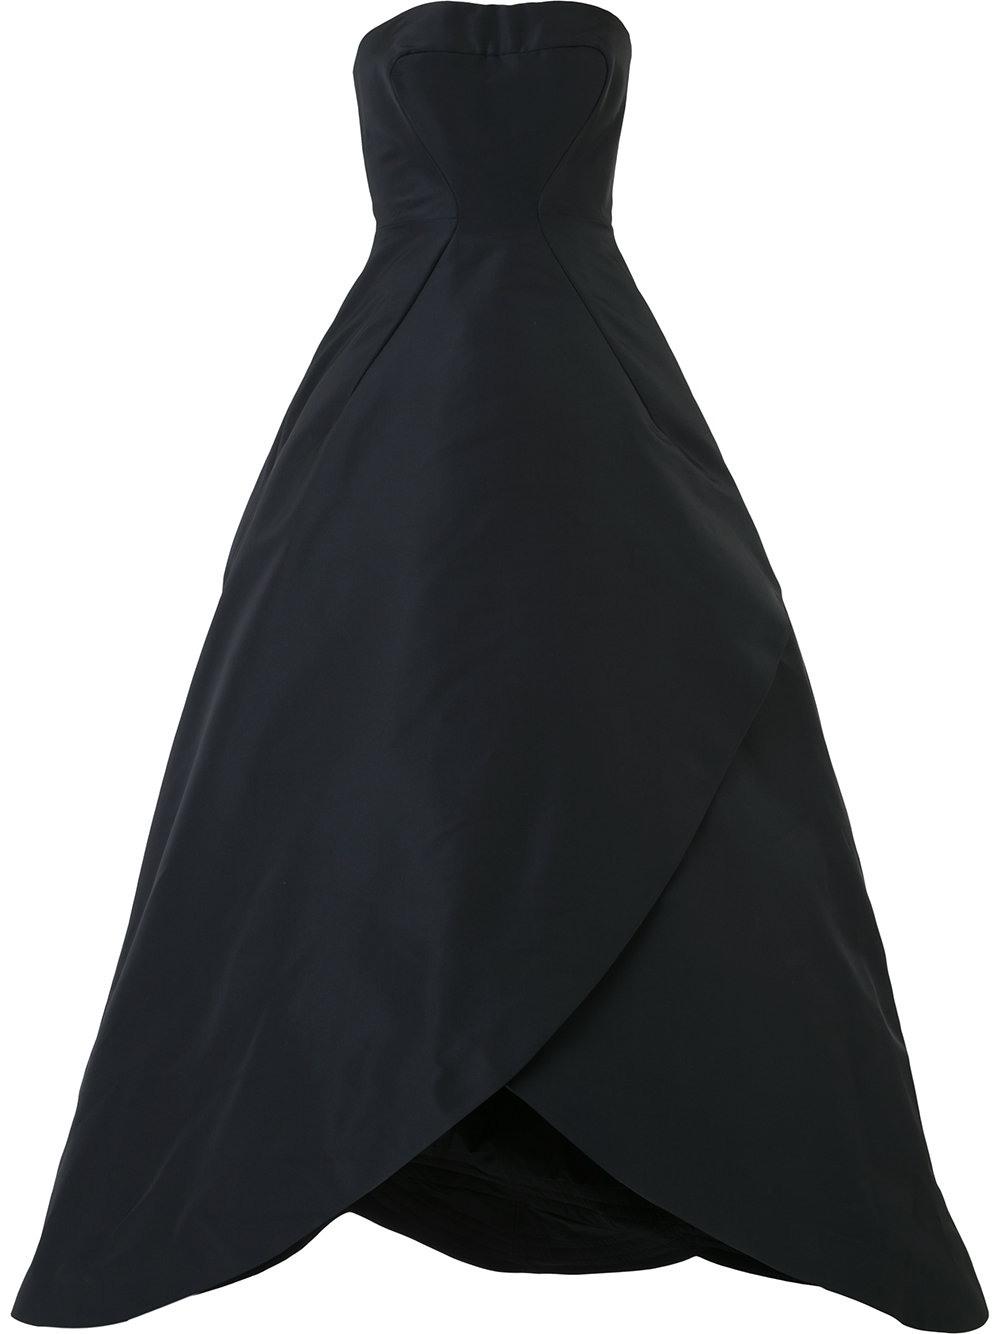 Designer Perfekt Abendrobe Damen Vertrieb - Abendkleid